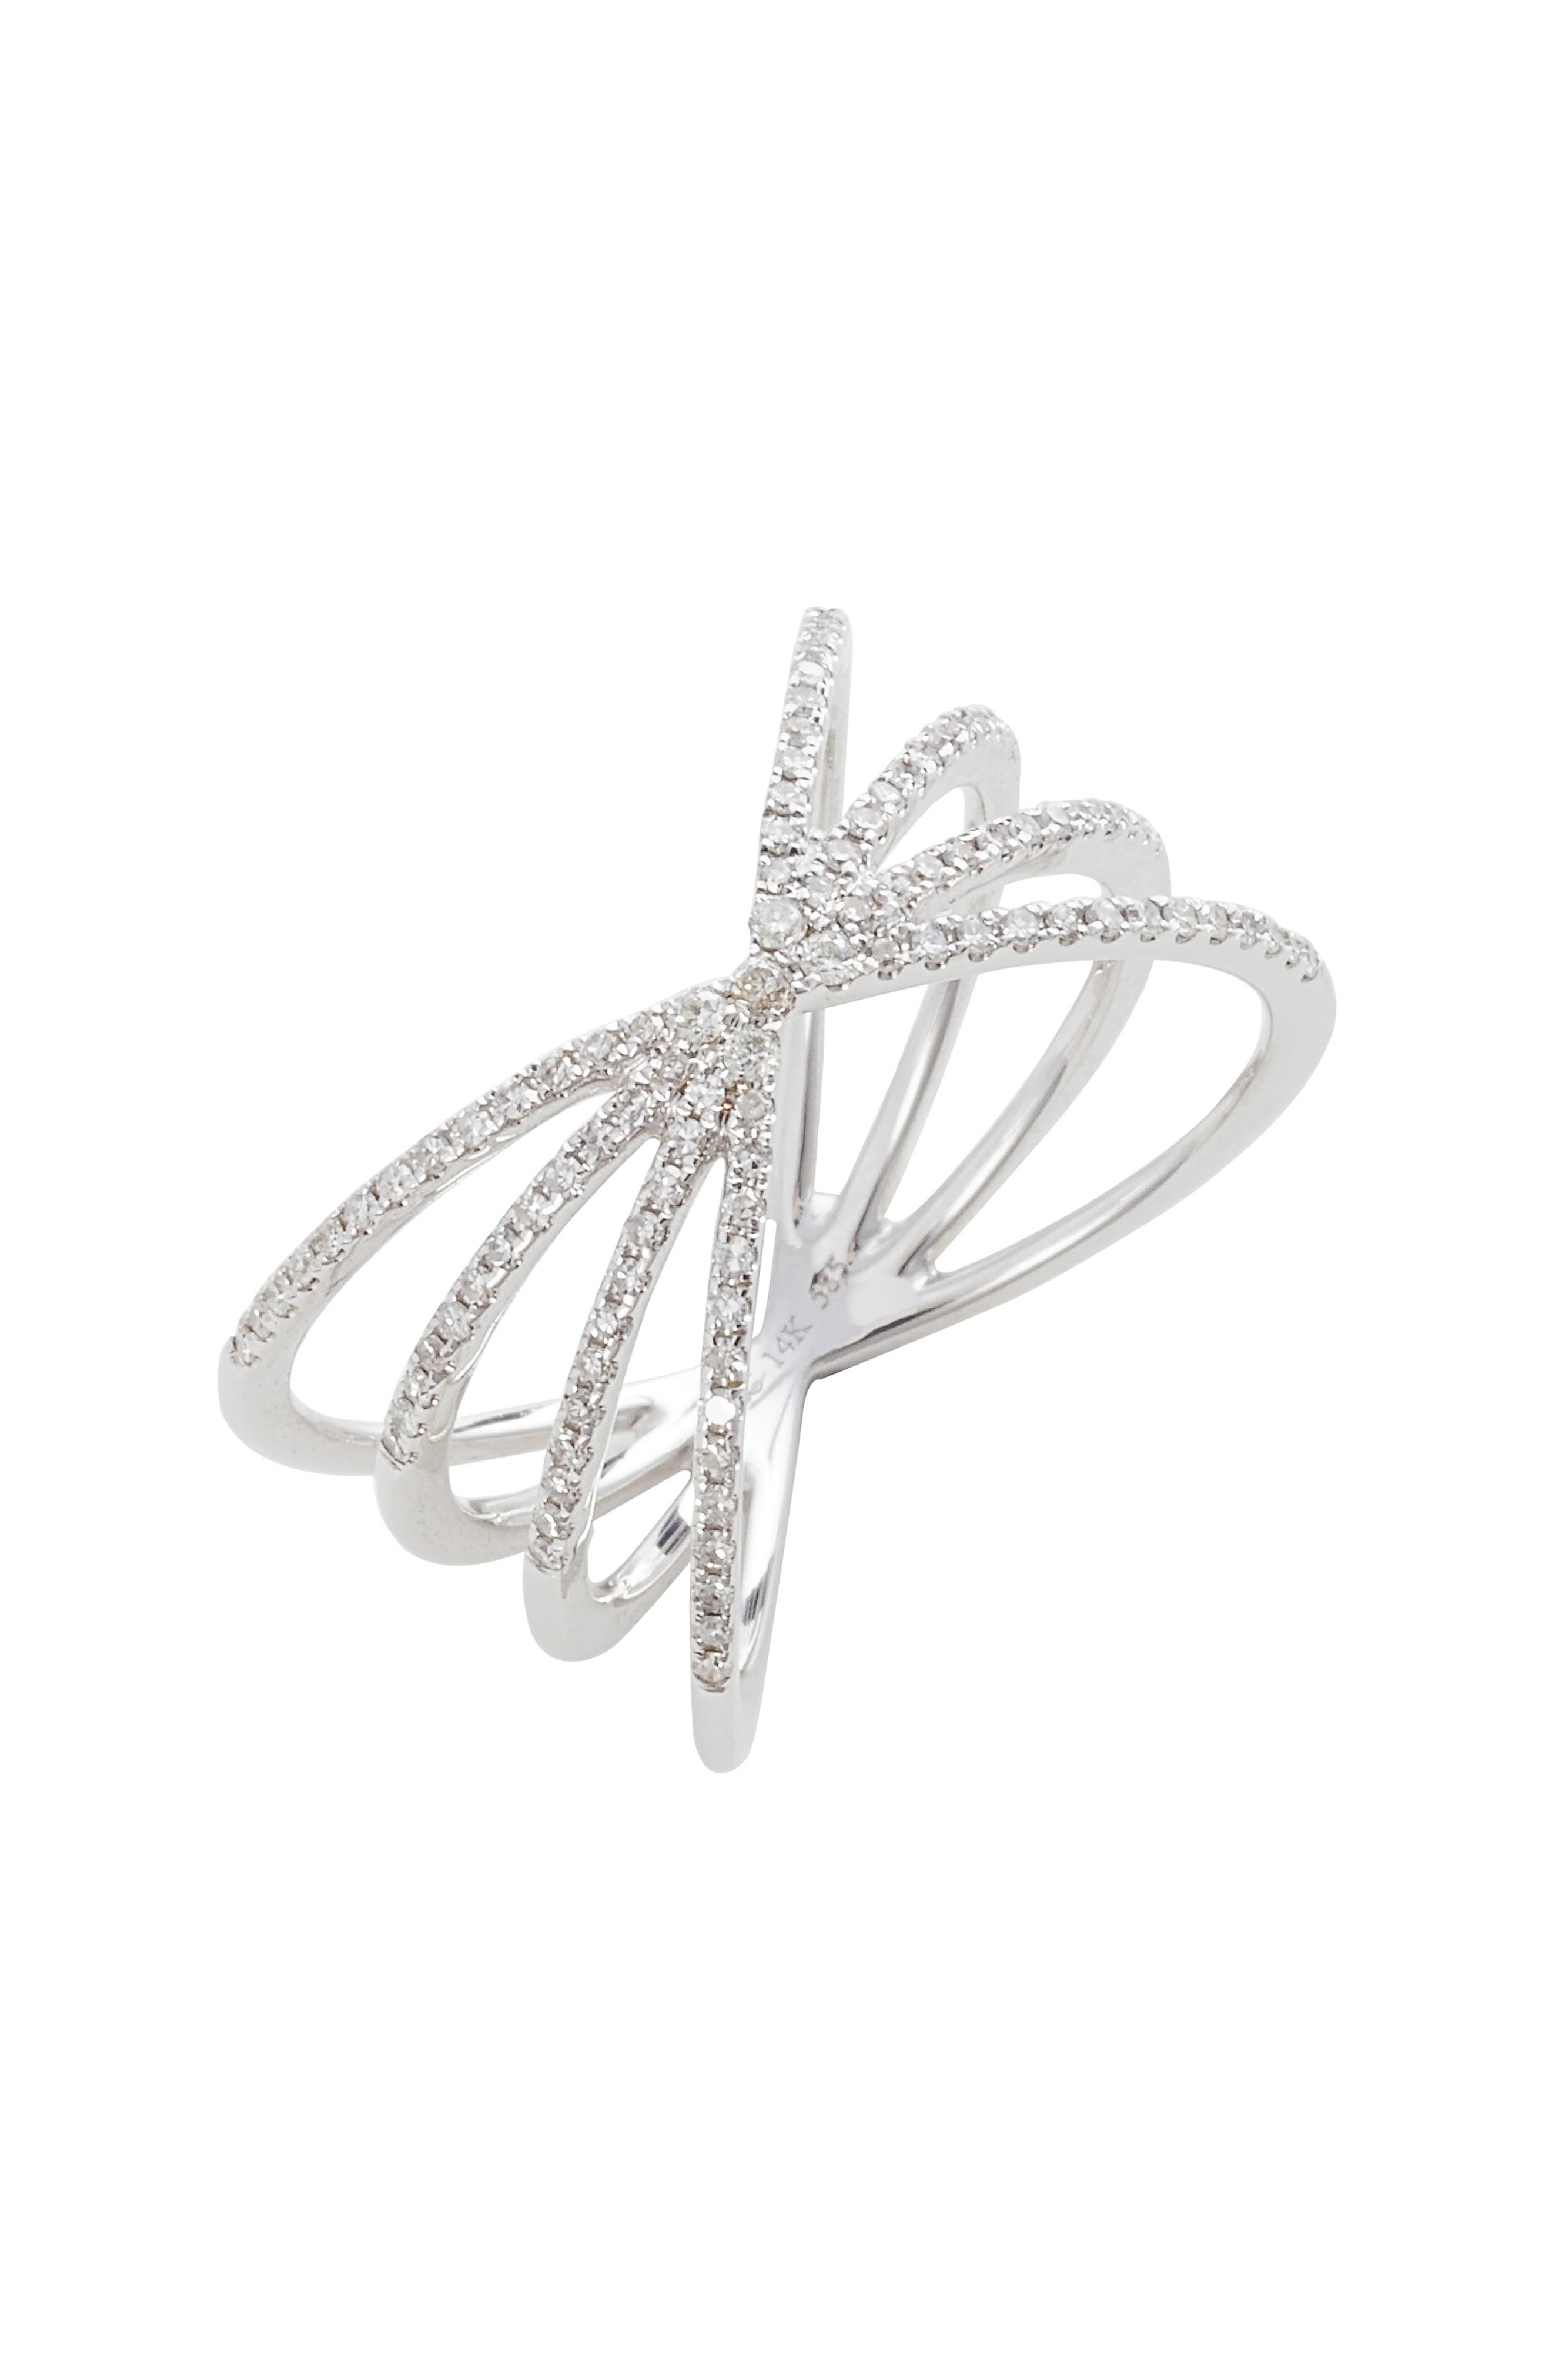 Alternate Image 1 Selected - EF COLLECTION Sunburst Diamond Ring